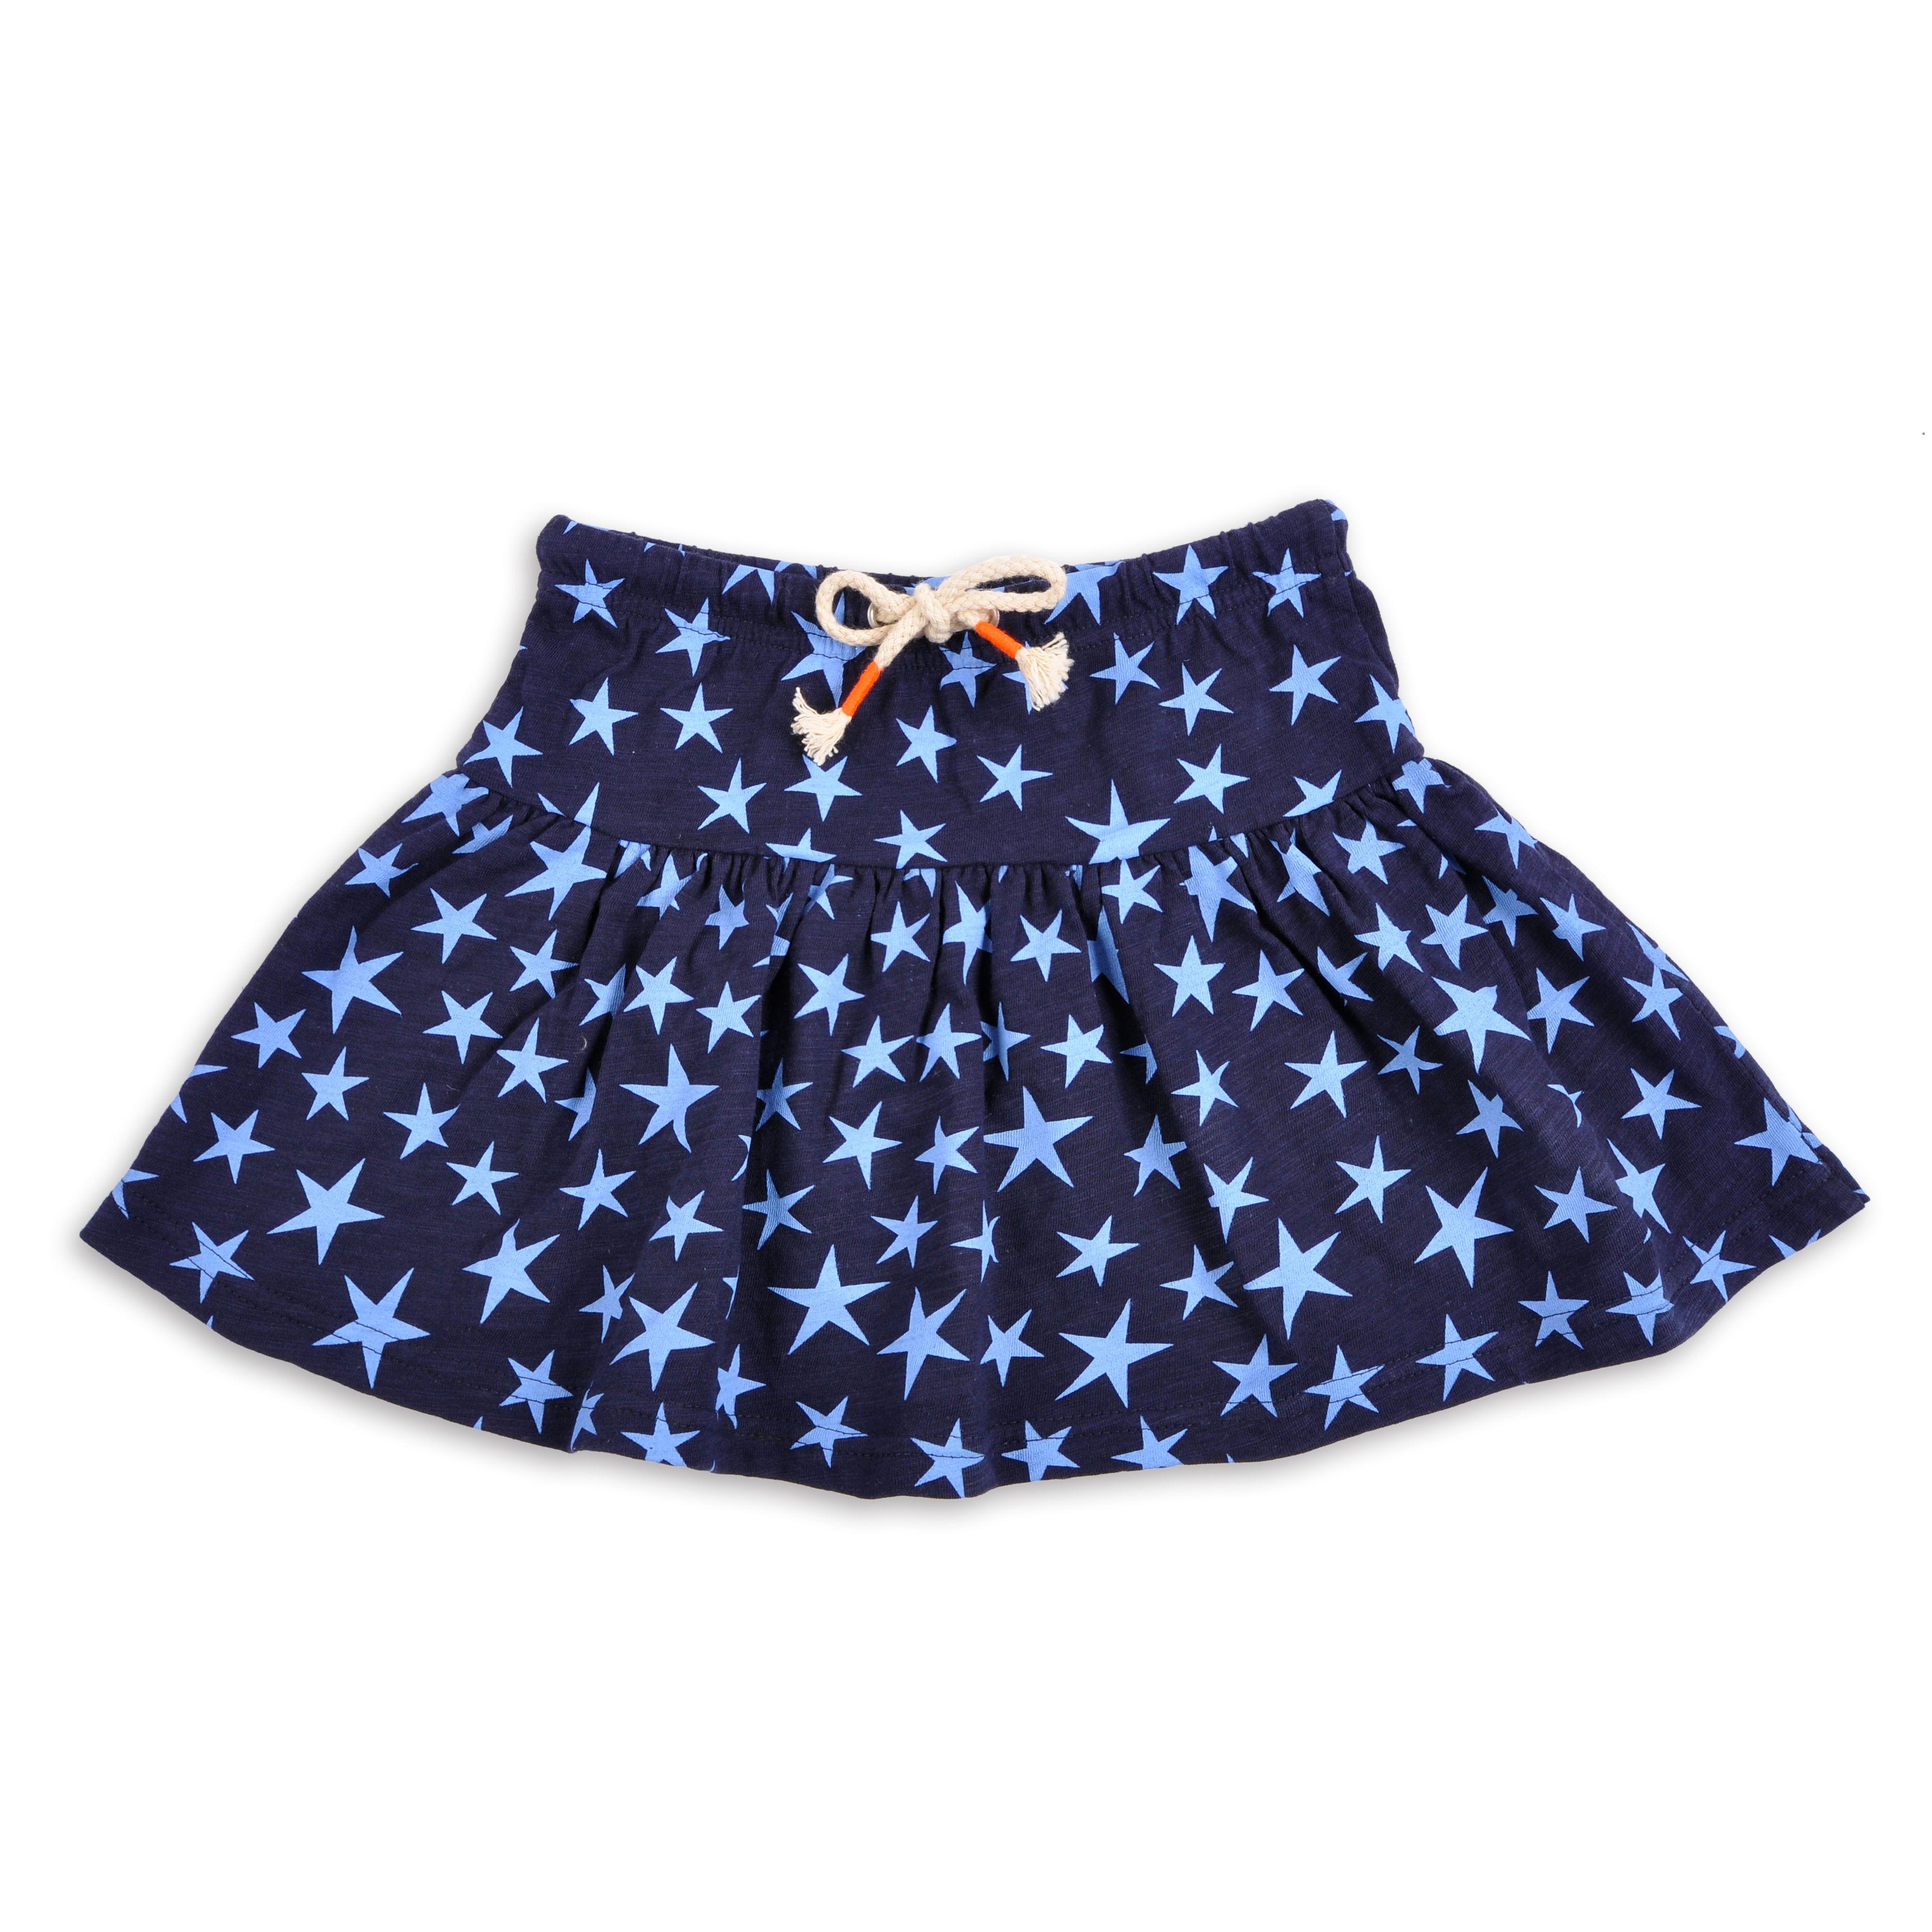 8a86b2659 Falda navy con estrellas para niñas - EPK | infantil | Faldas ...